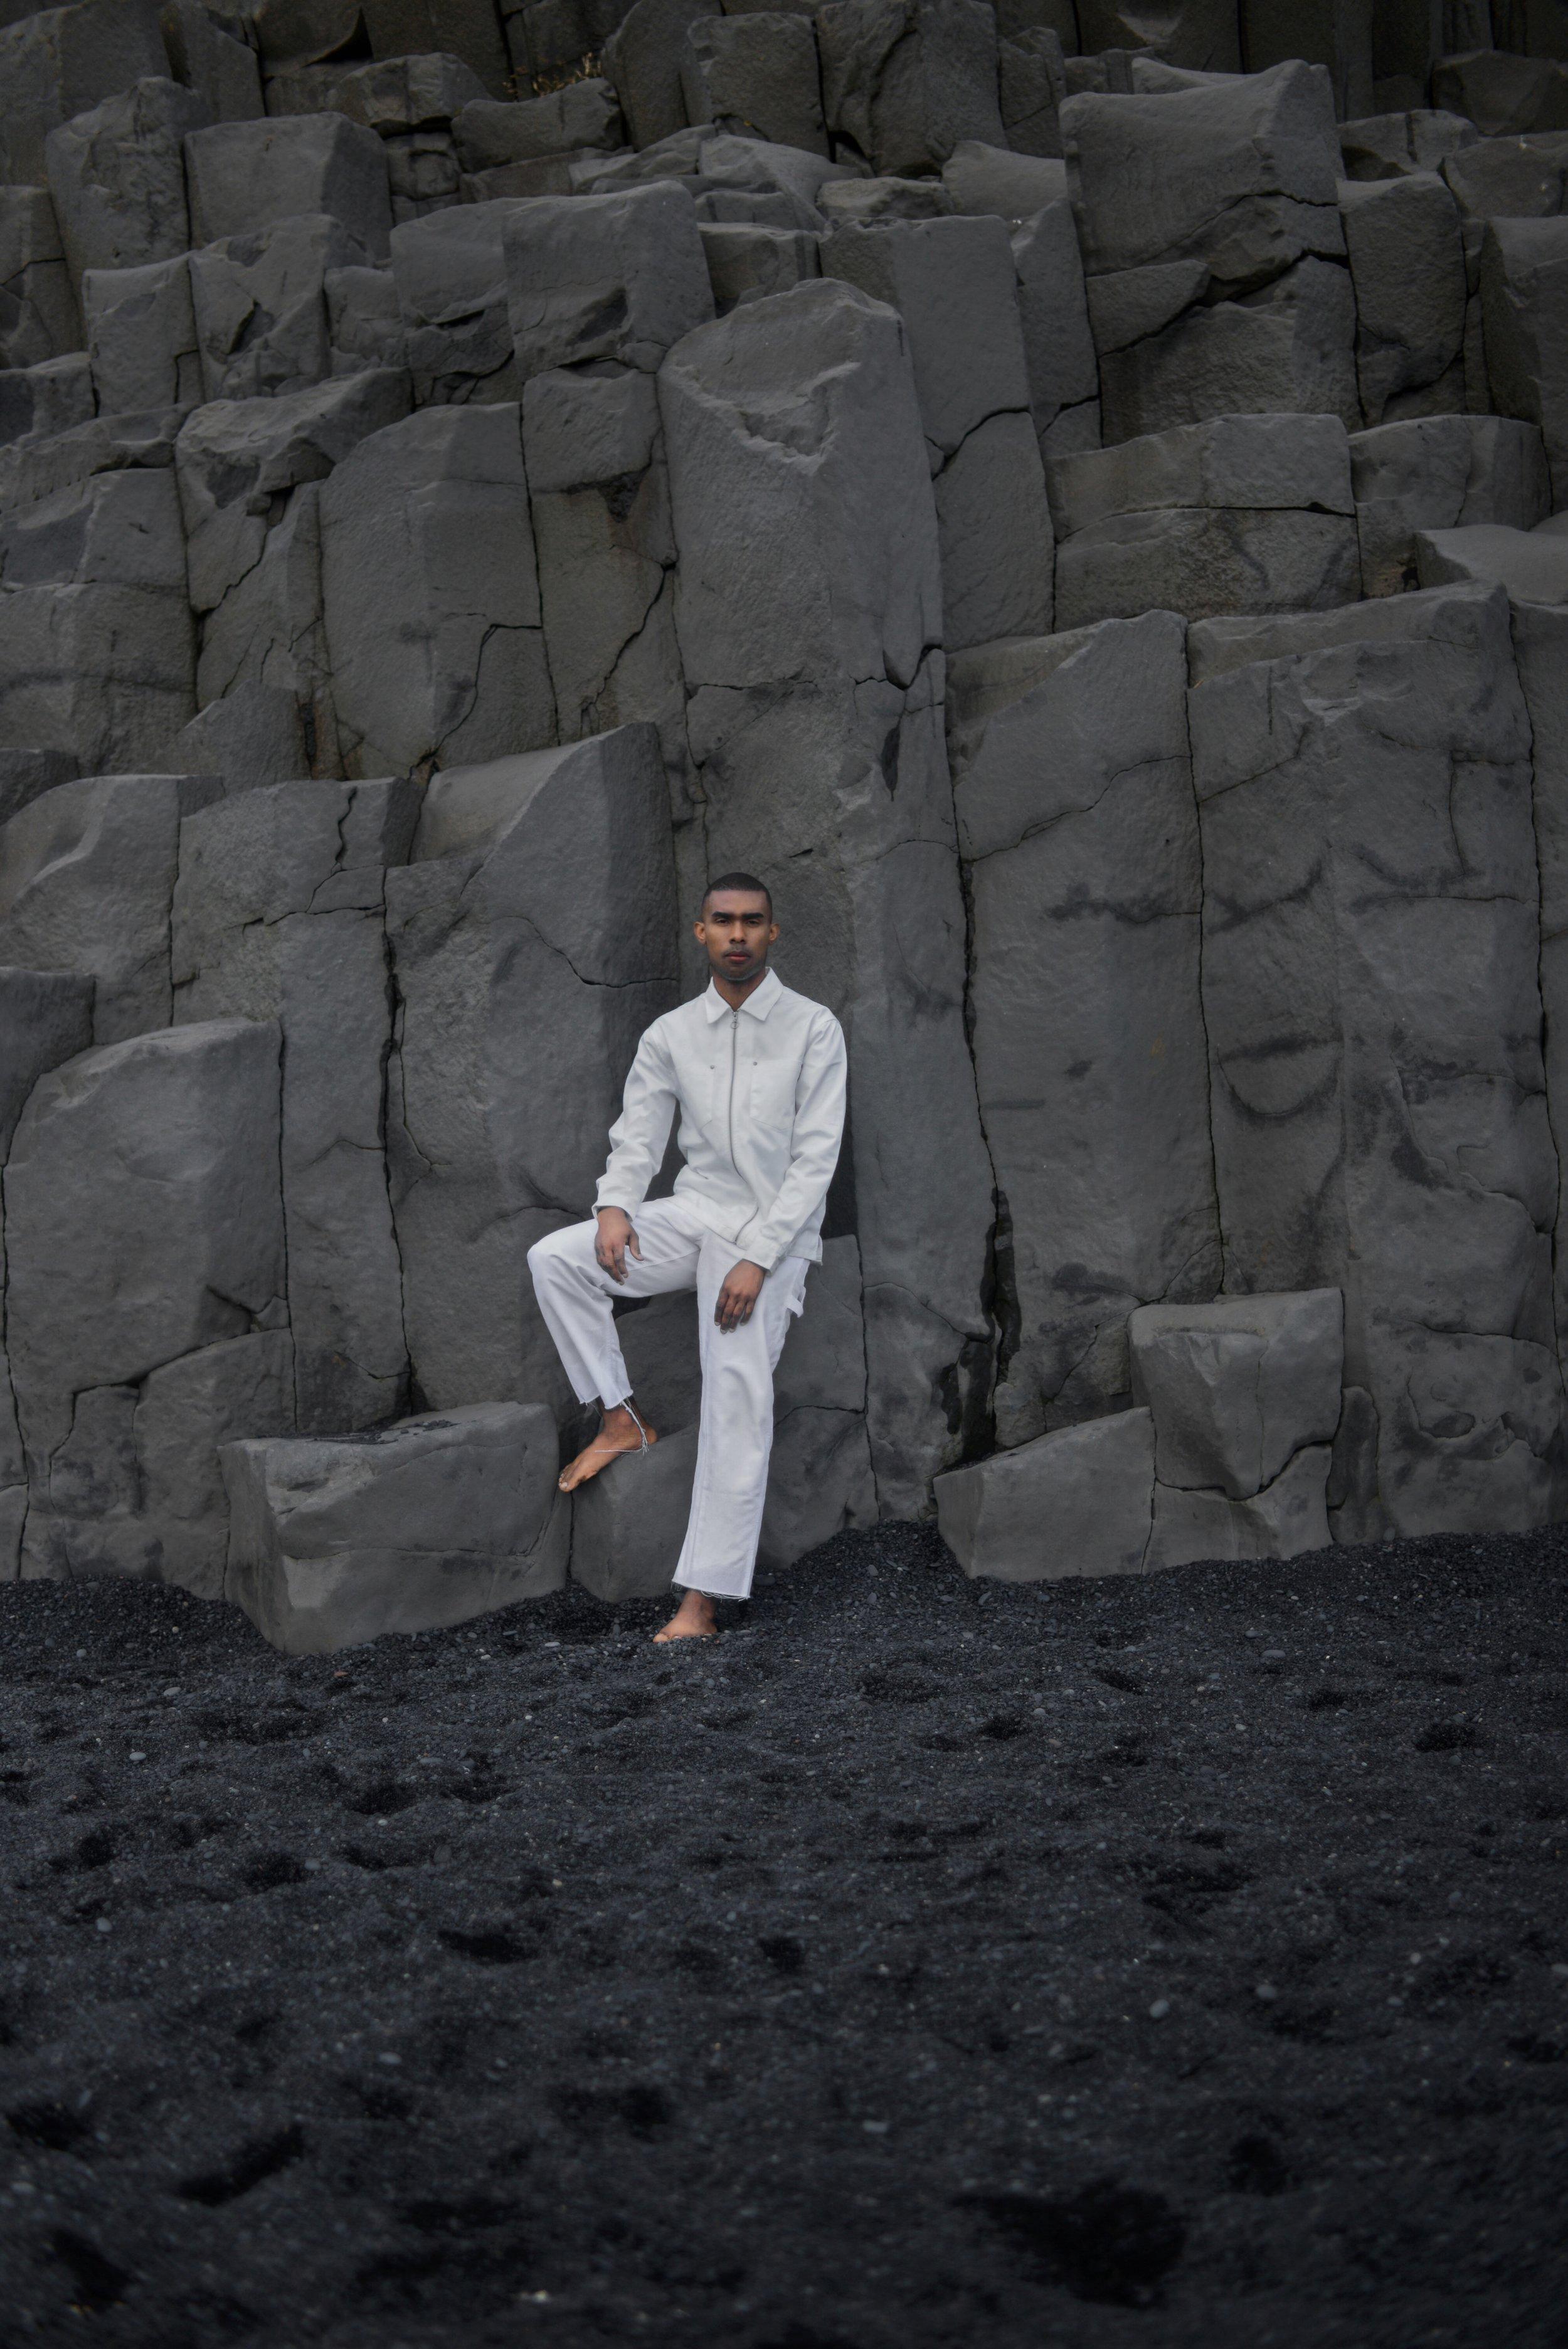 The-Look-Principle-Editorial-Reynisfjara-Beach-8.jpg